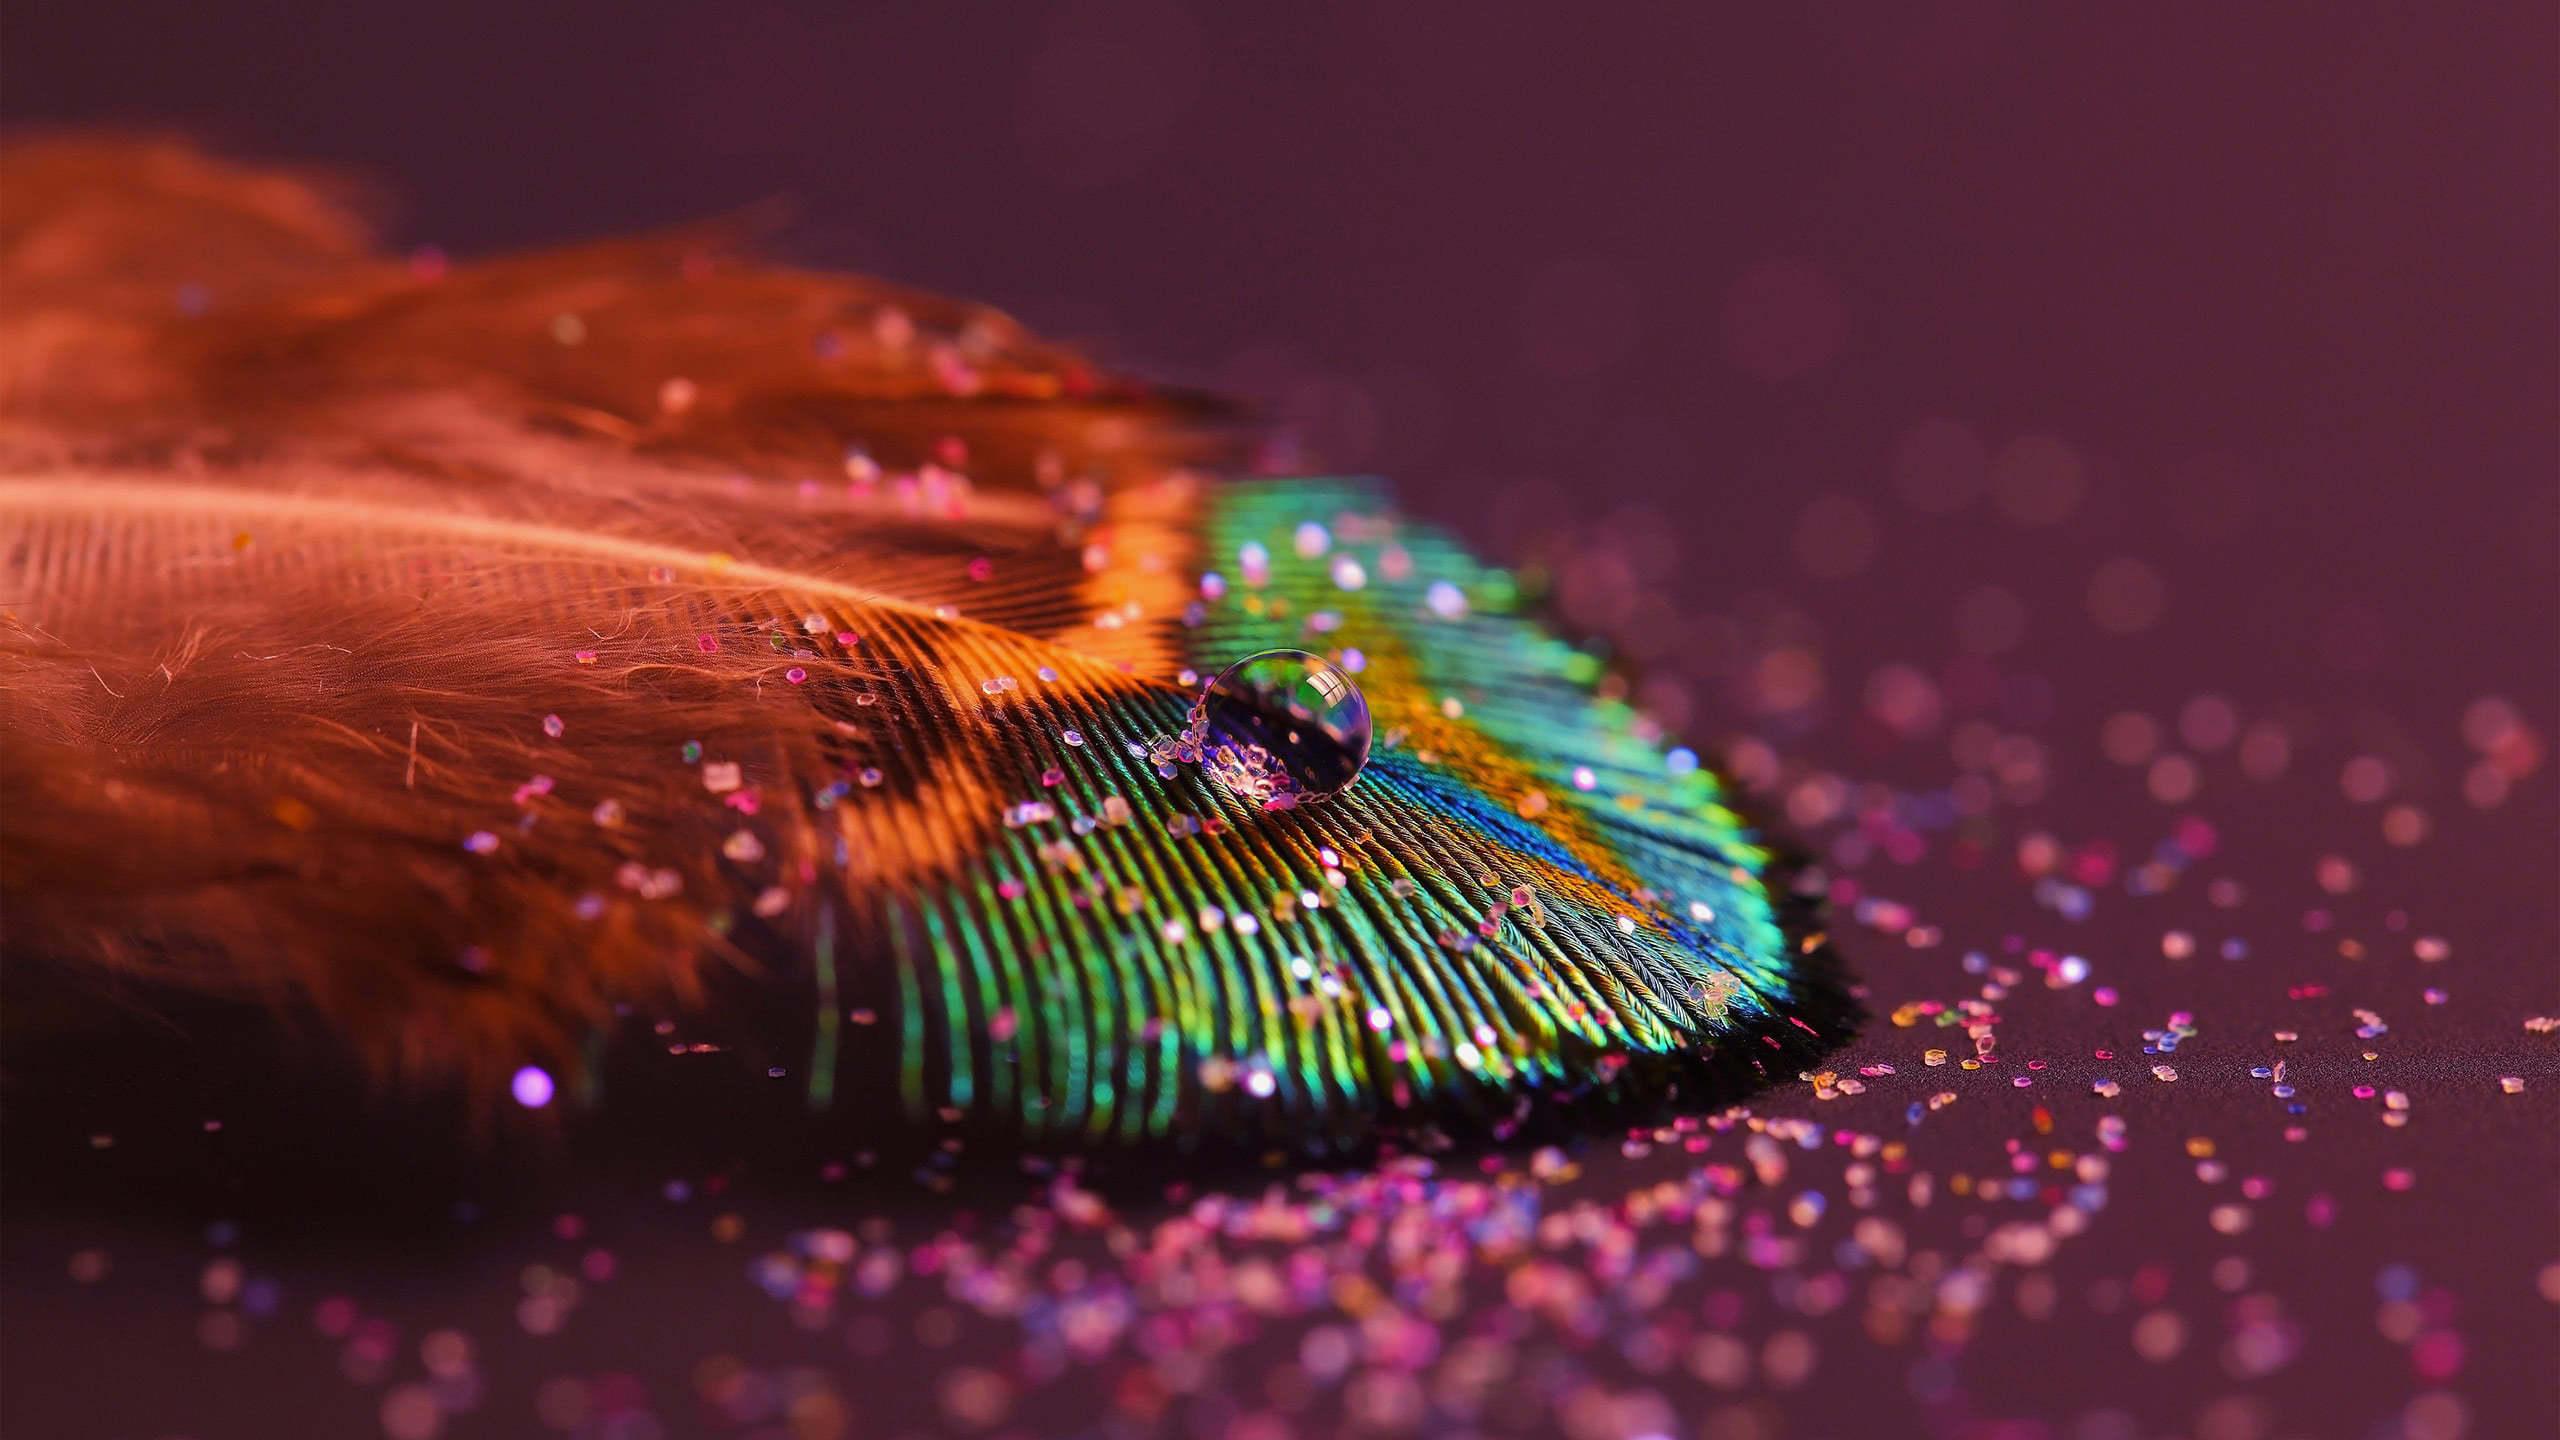 peacock feather wqhd 1440p wallpaper